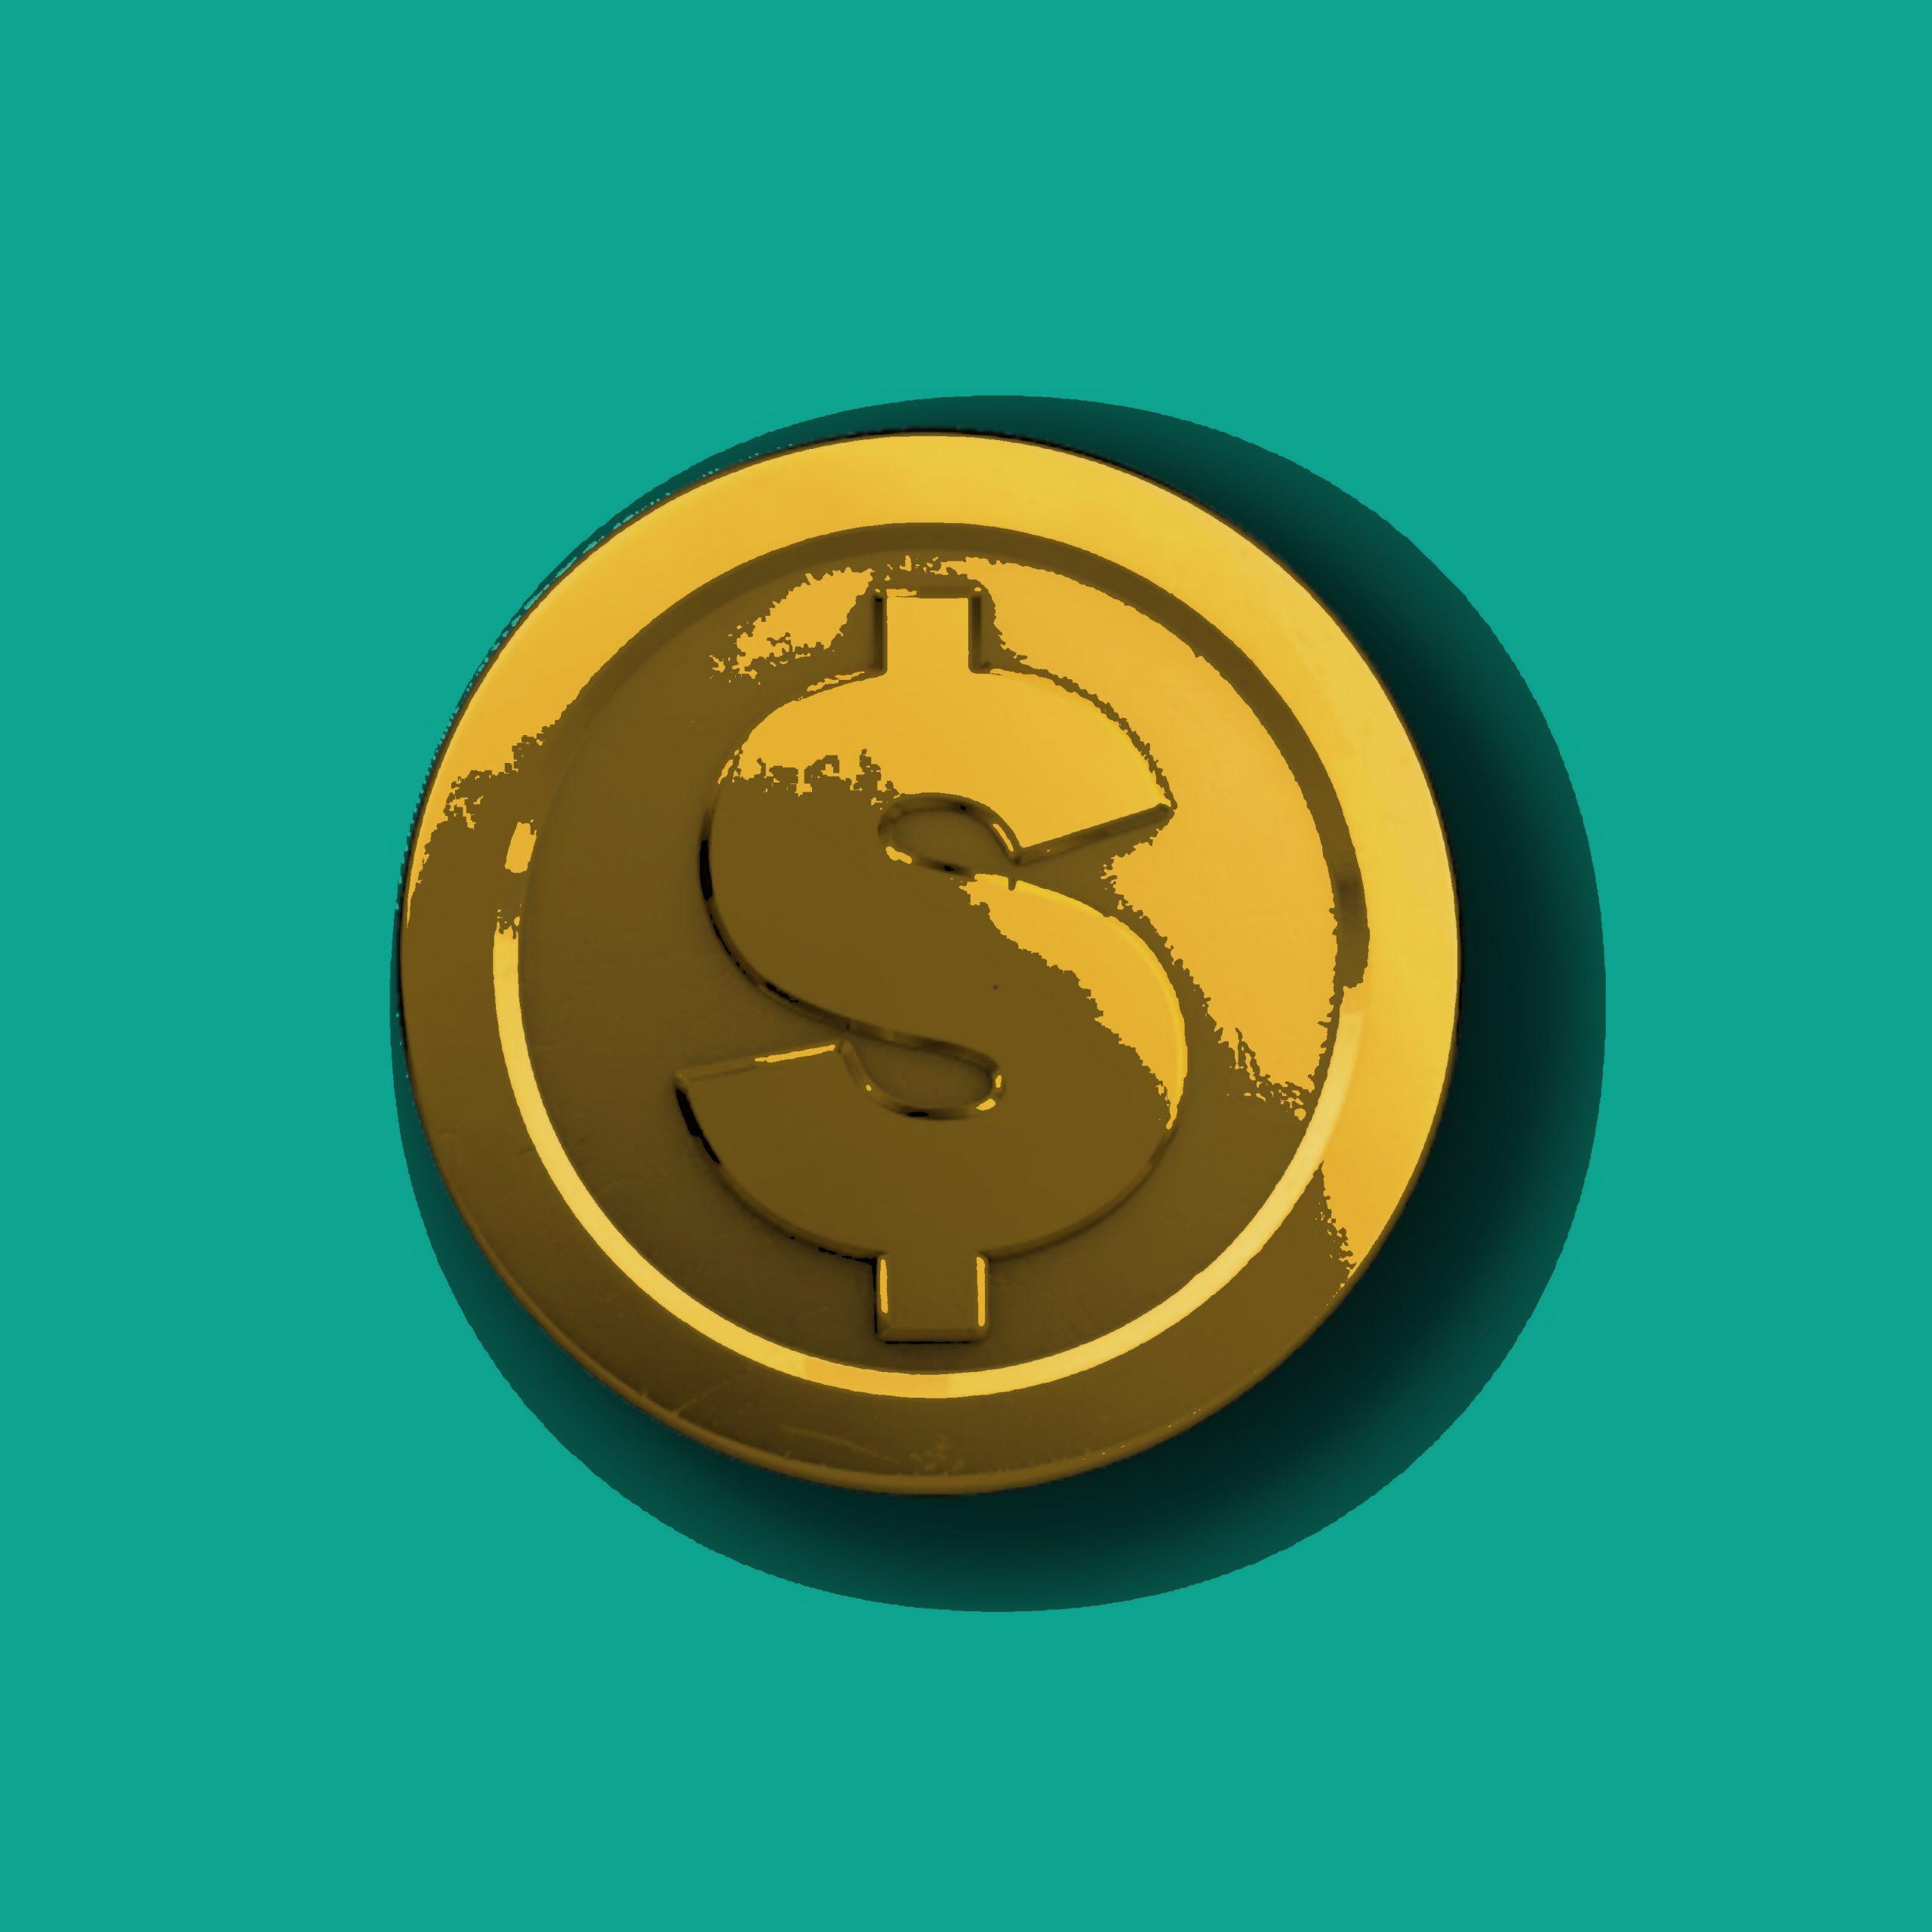 A bitcoin illustration